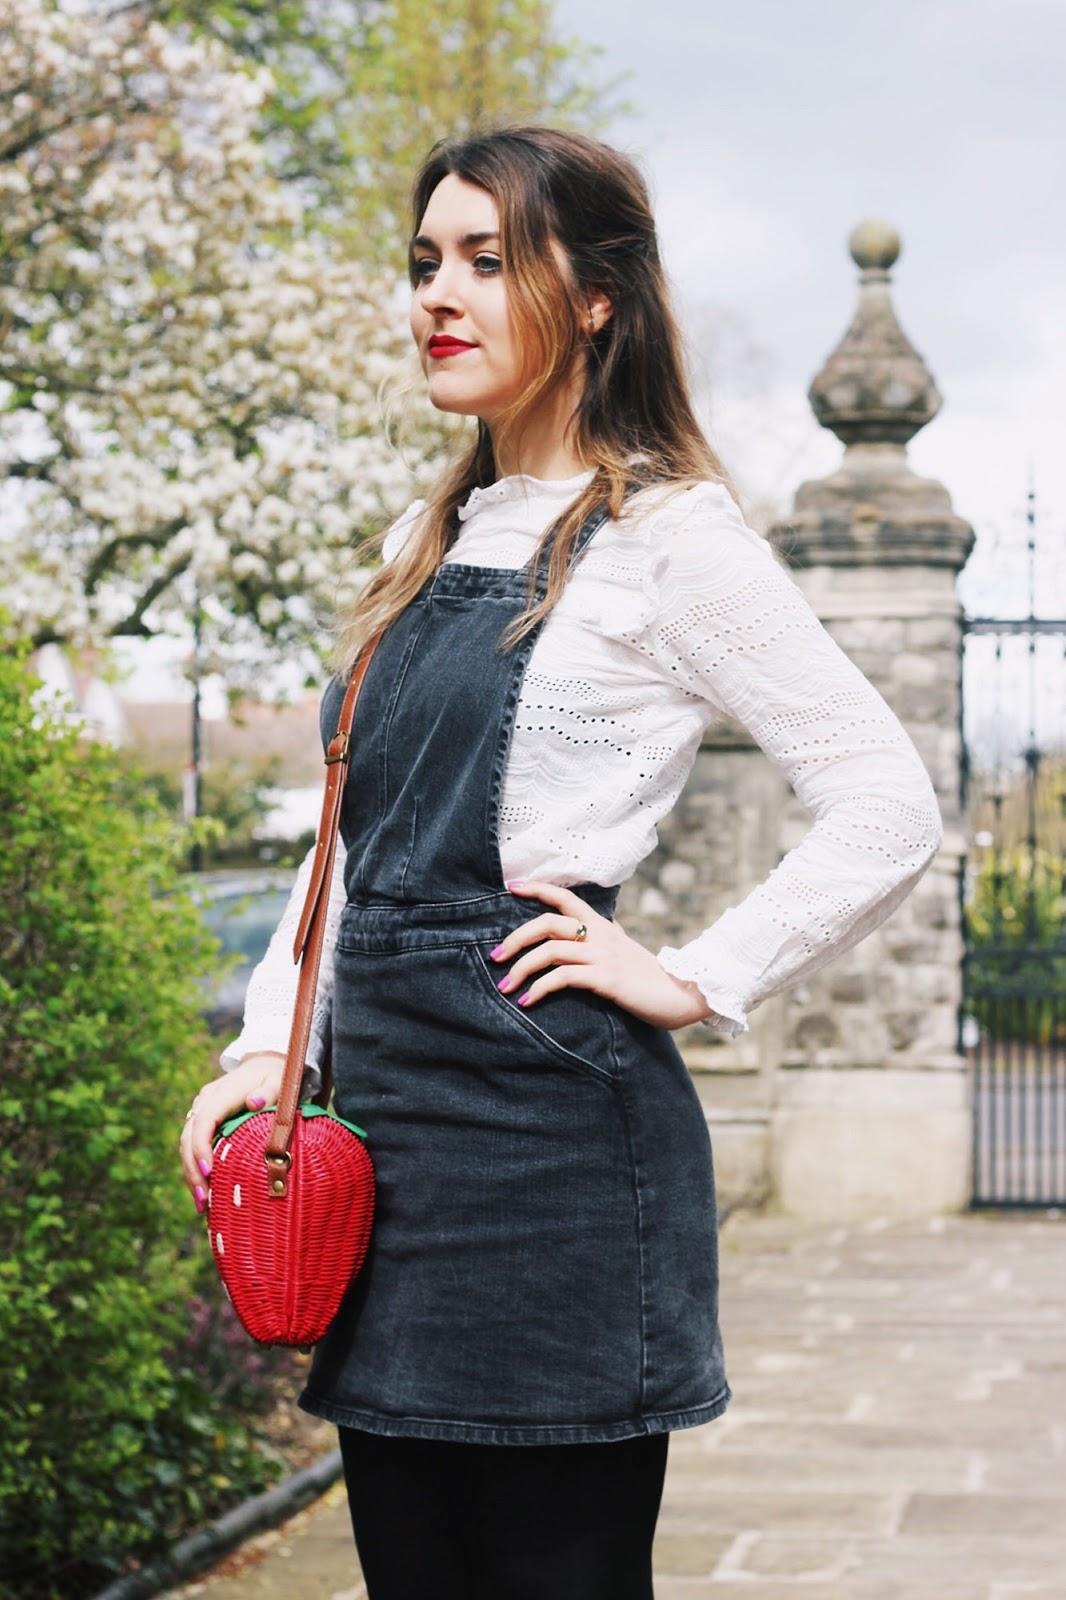 London fashion bloggers